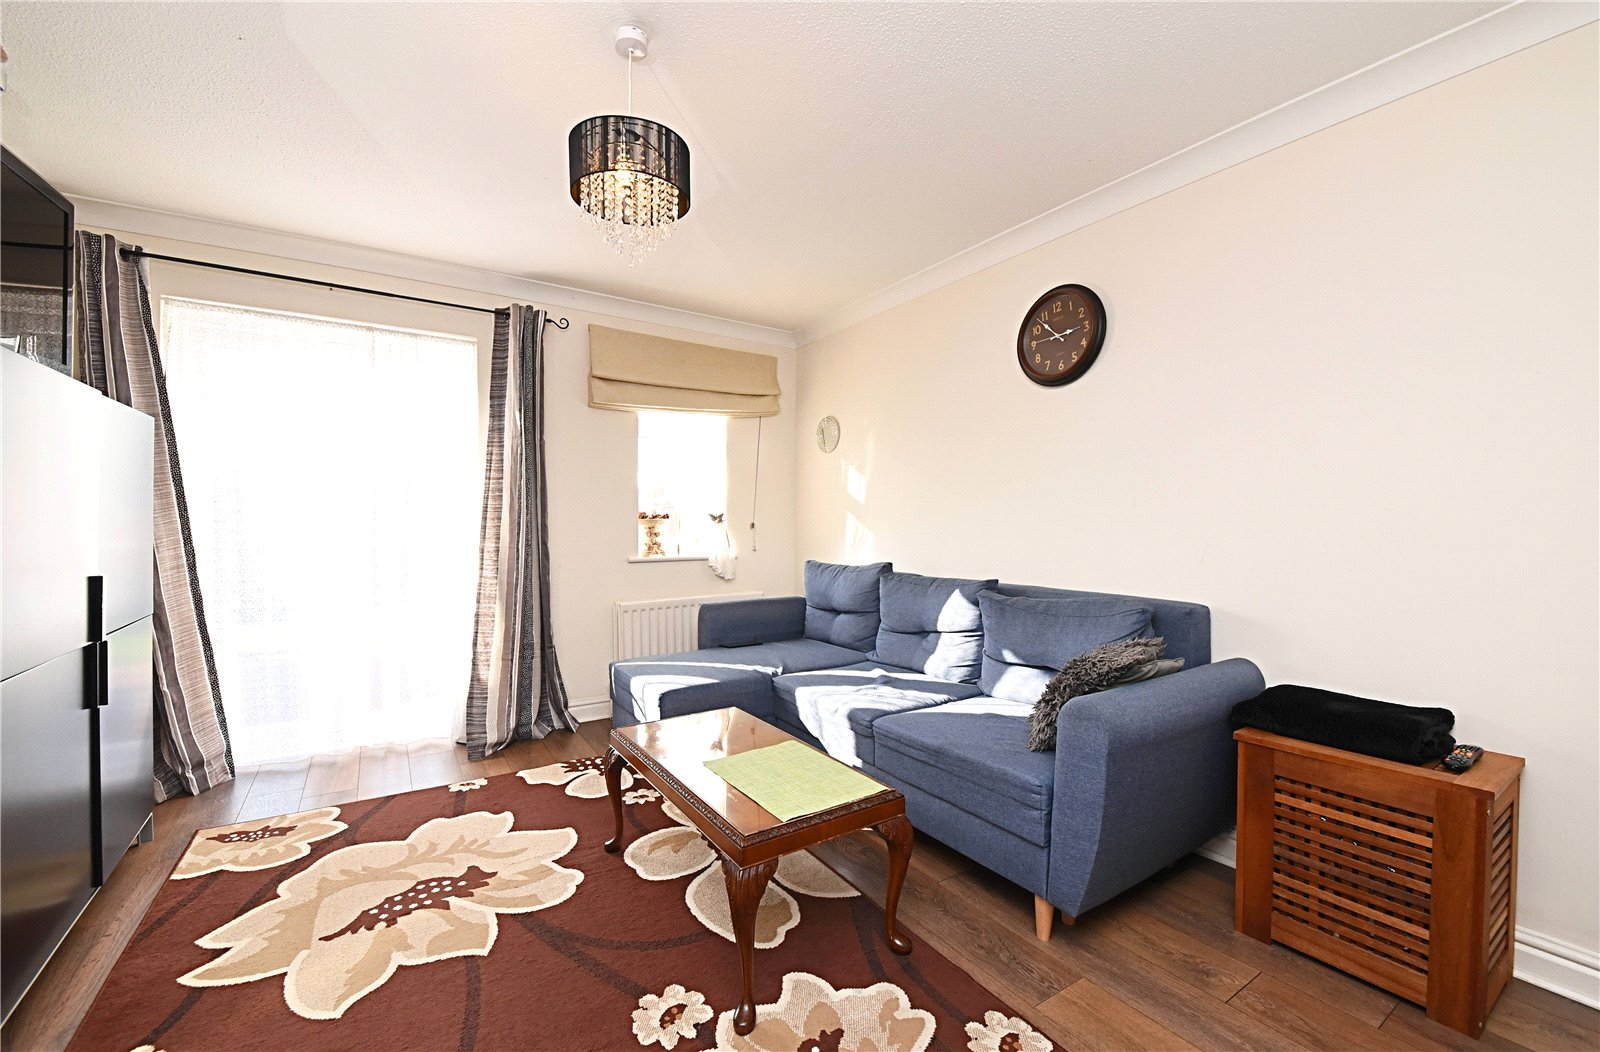 2 bed house to rent in Harrow Weald, HA3 6DA  - Property Image 1